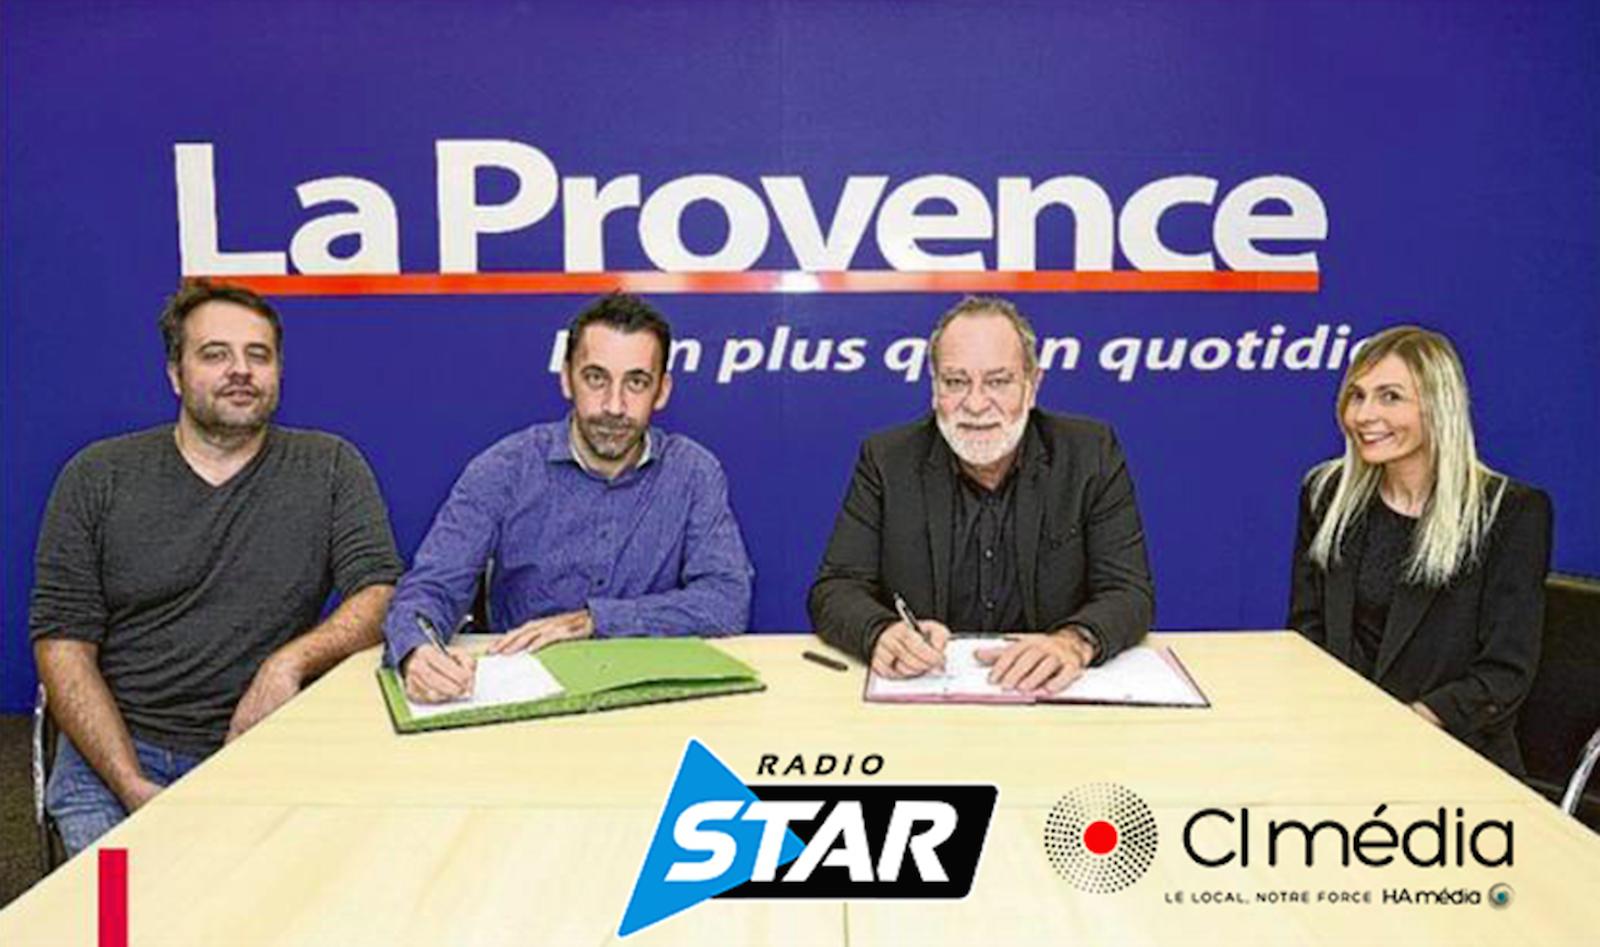 Radio Star signe un partenariat avec La Provence